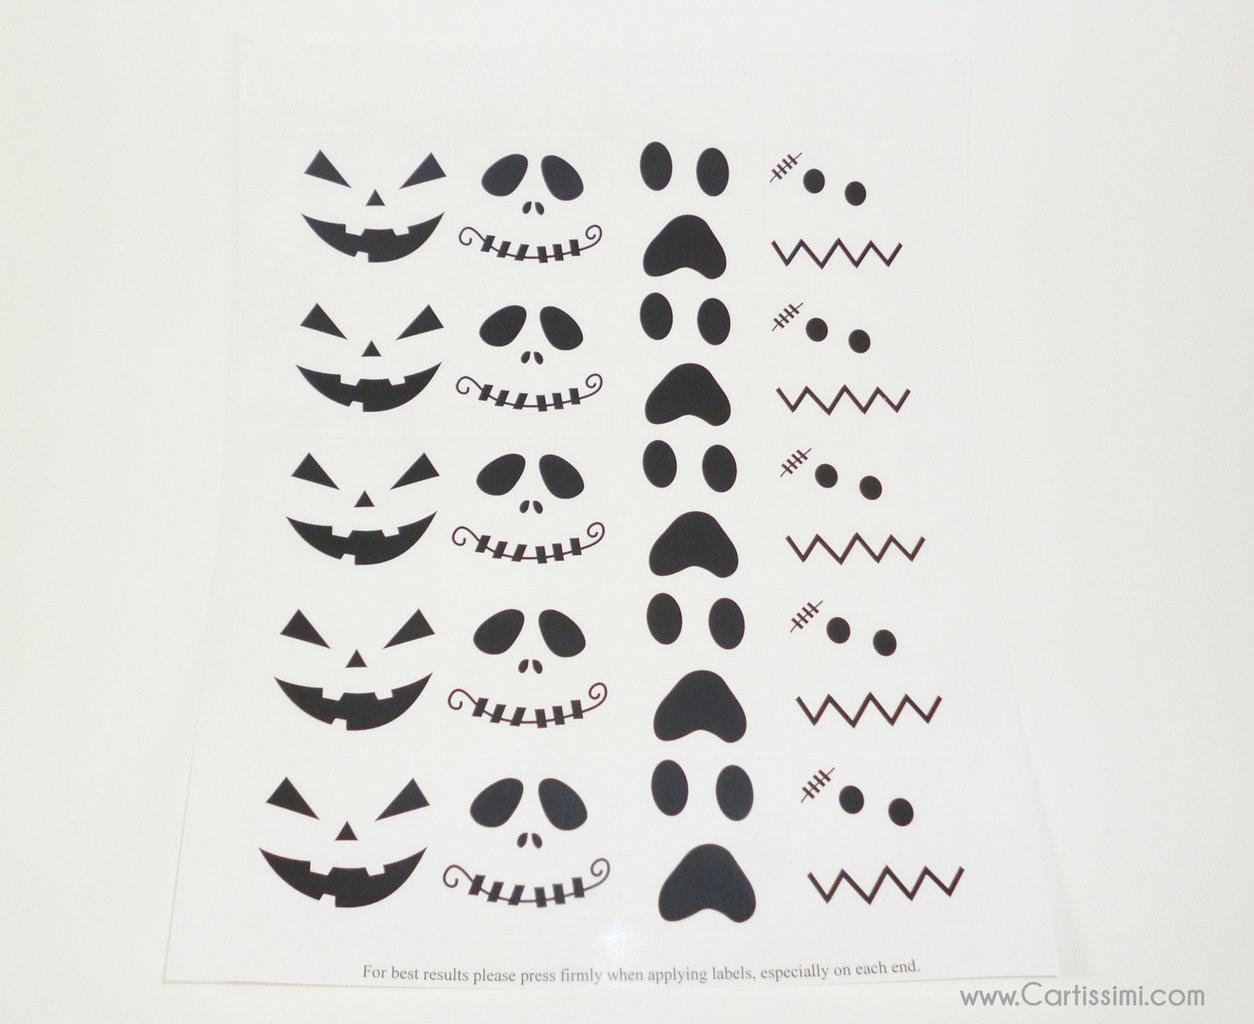 20 schaurig lustige halloween gesichter aufkleber. Black Bedroom Furniture Sets. Home Design Ideas